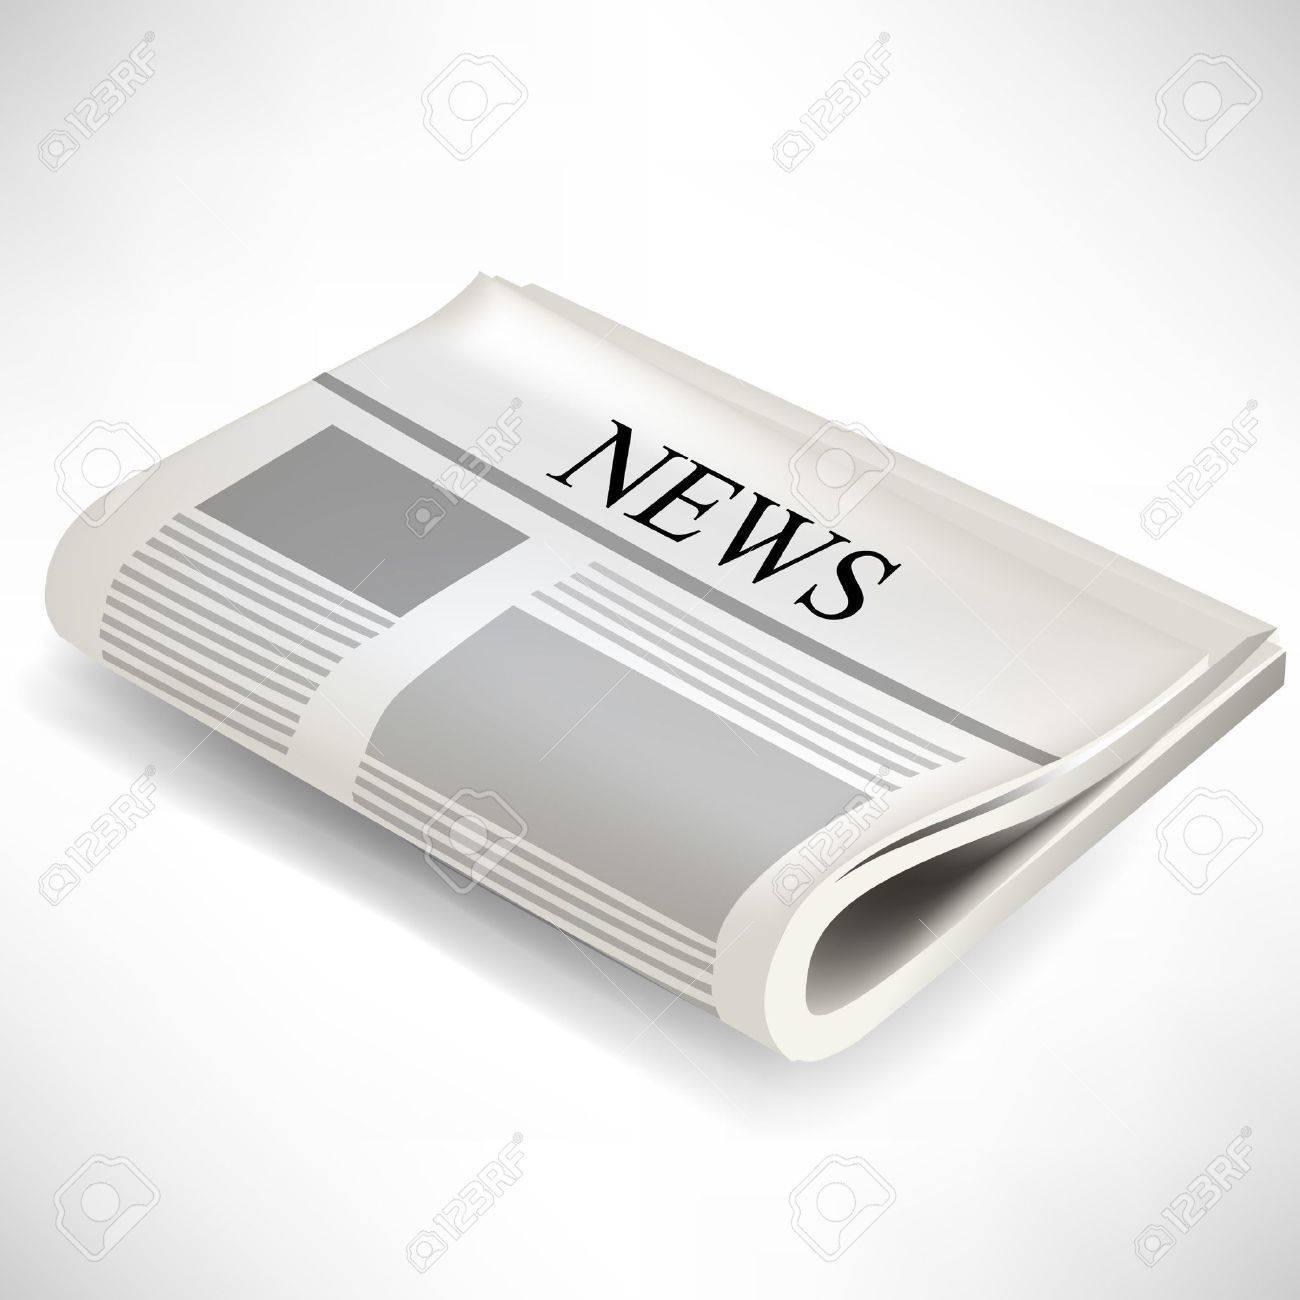 6,981 Newspaper Headline Stock Vector Illustration And Royalty ...